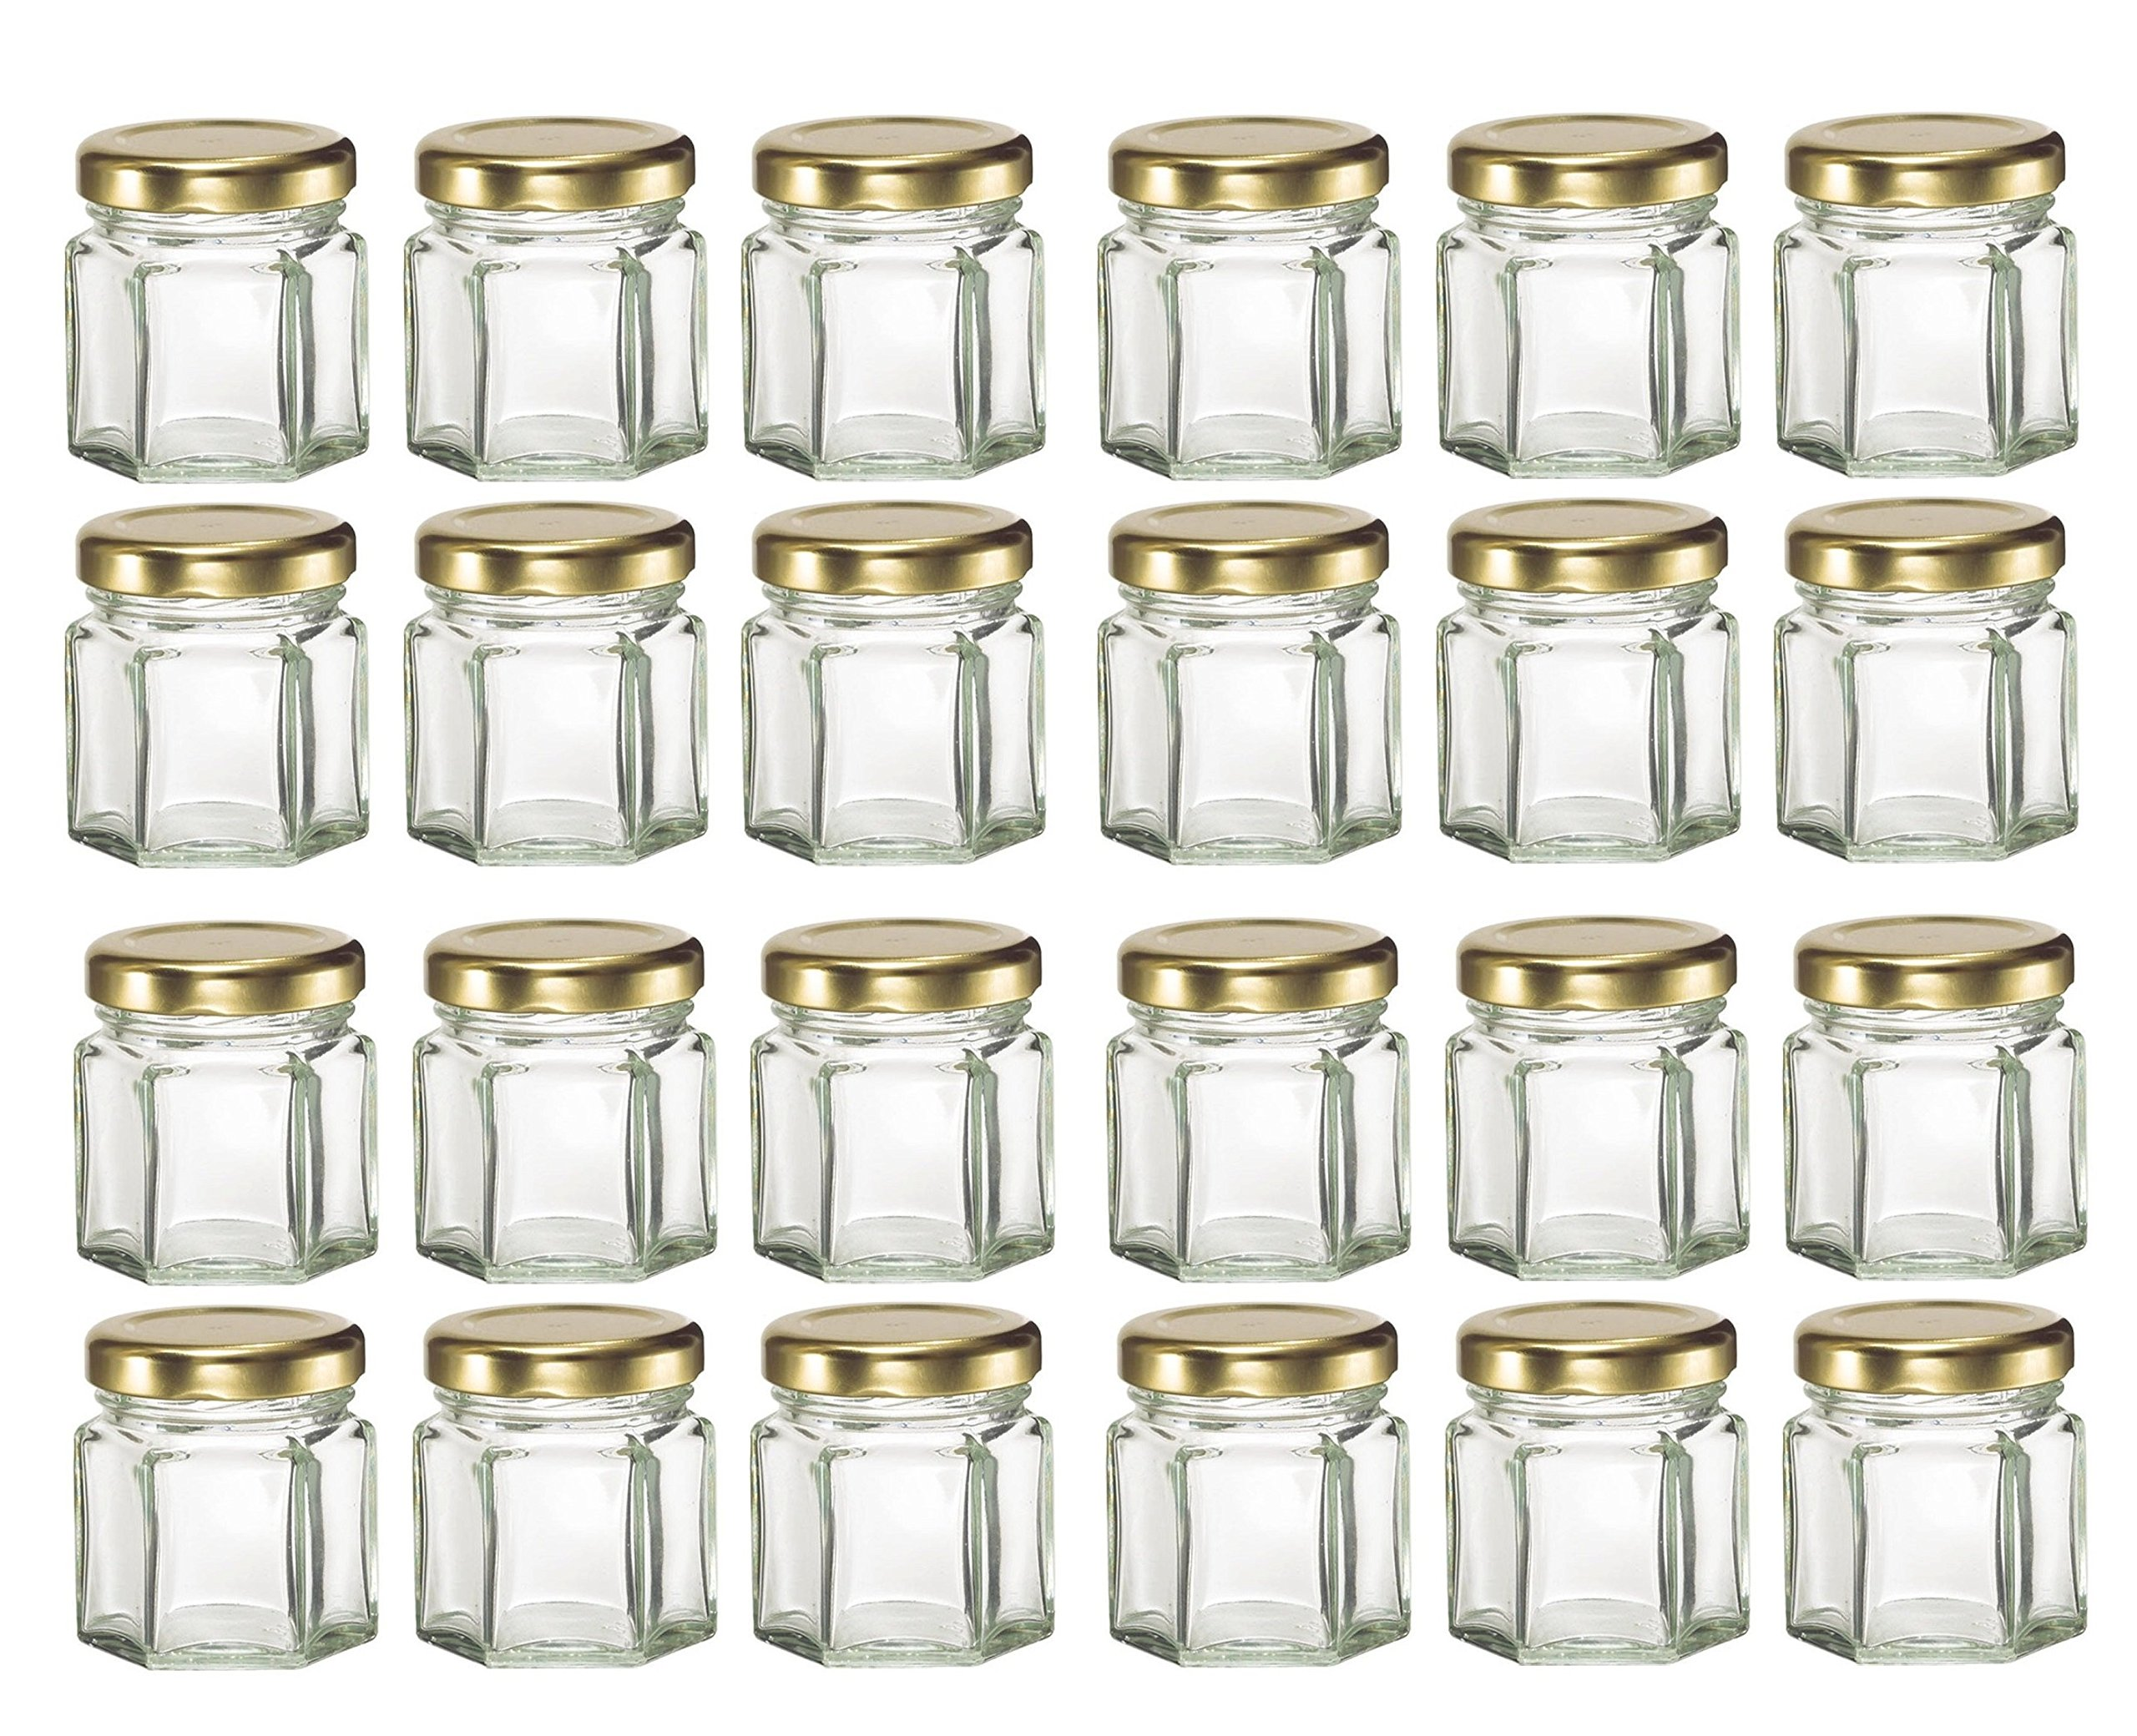 Nakpunar 24 pcs, 1.5 oz Mini Hexagon Glass Jars with Gold Plastisol Lined Lids